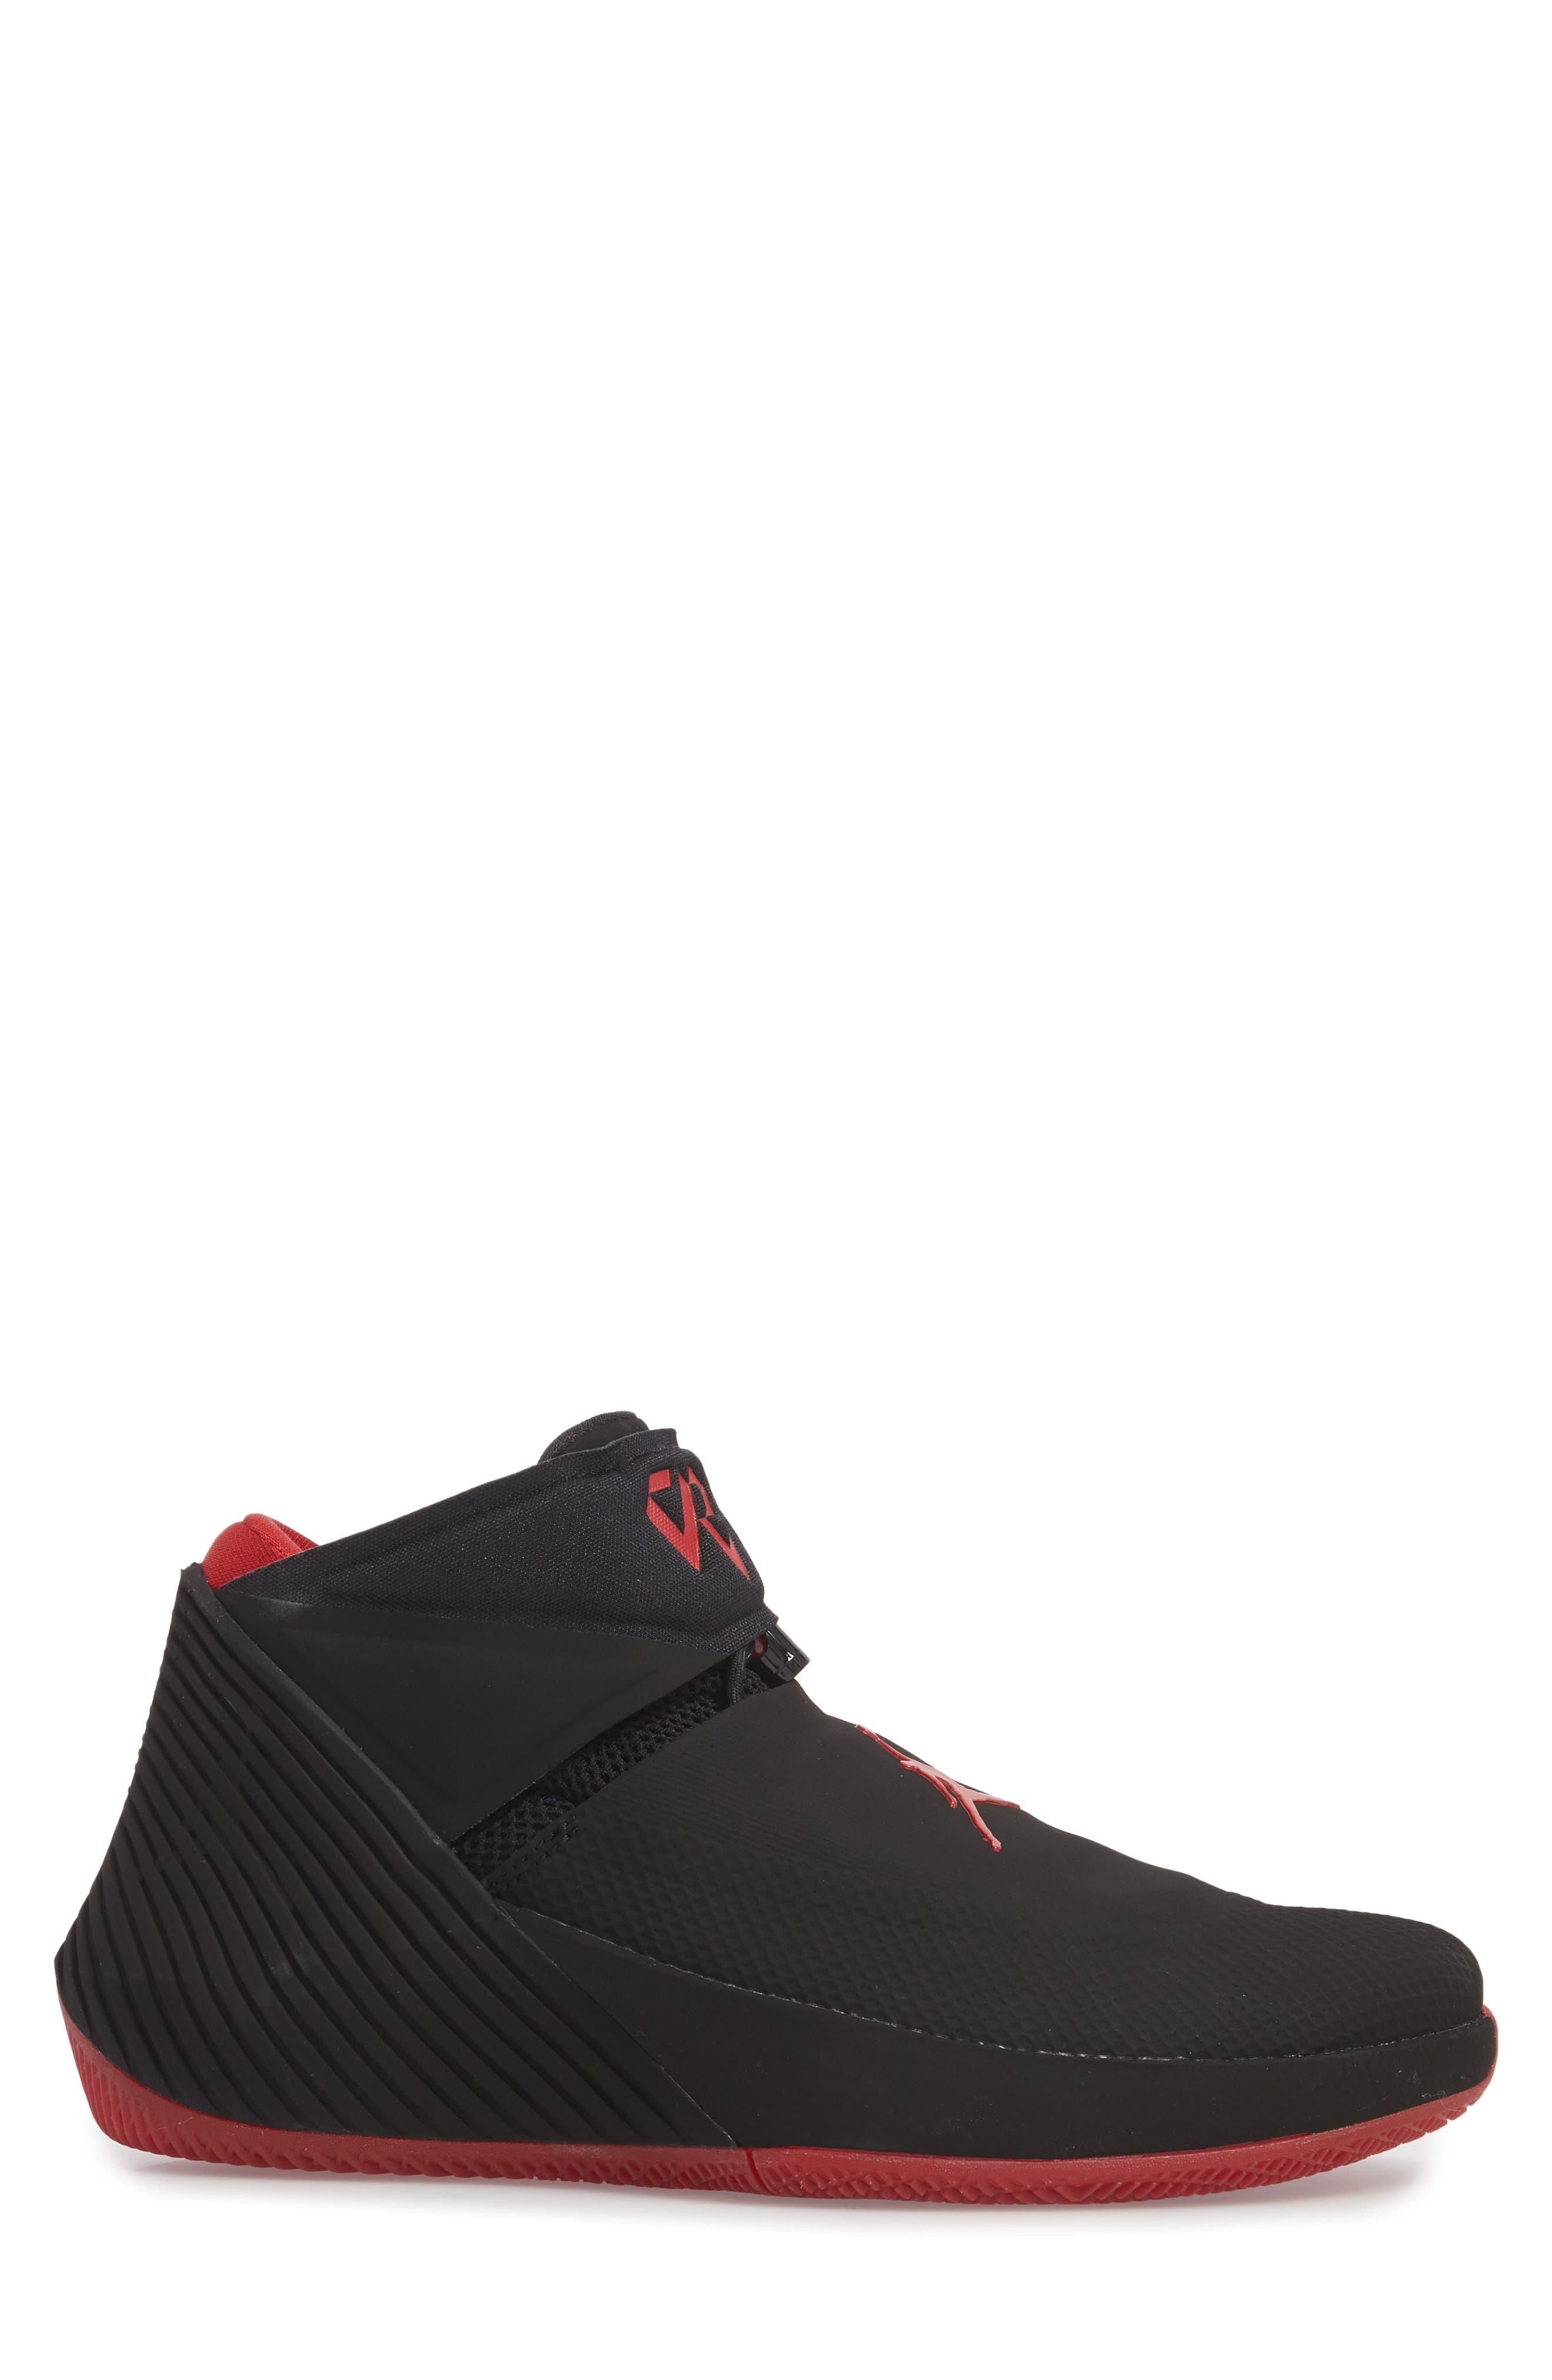 Jordan 'Why Not?' Zero.1 Basketball Shoe,                             Alternate thumbnail 3, color,                             Black/ Hyper Royal